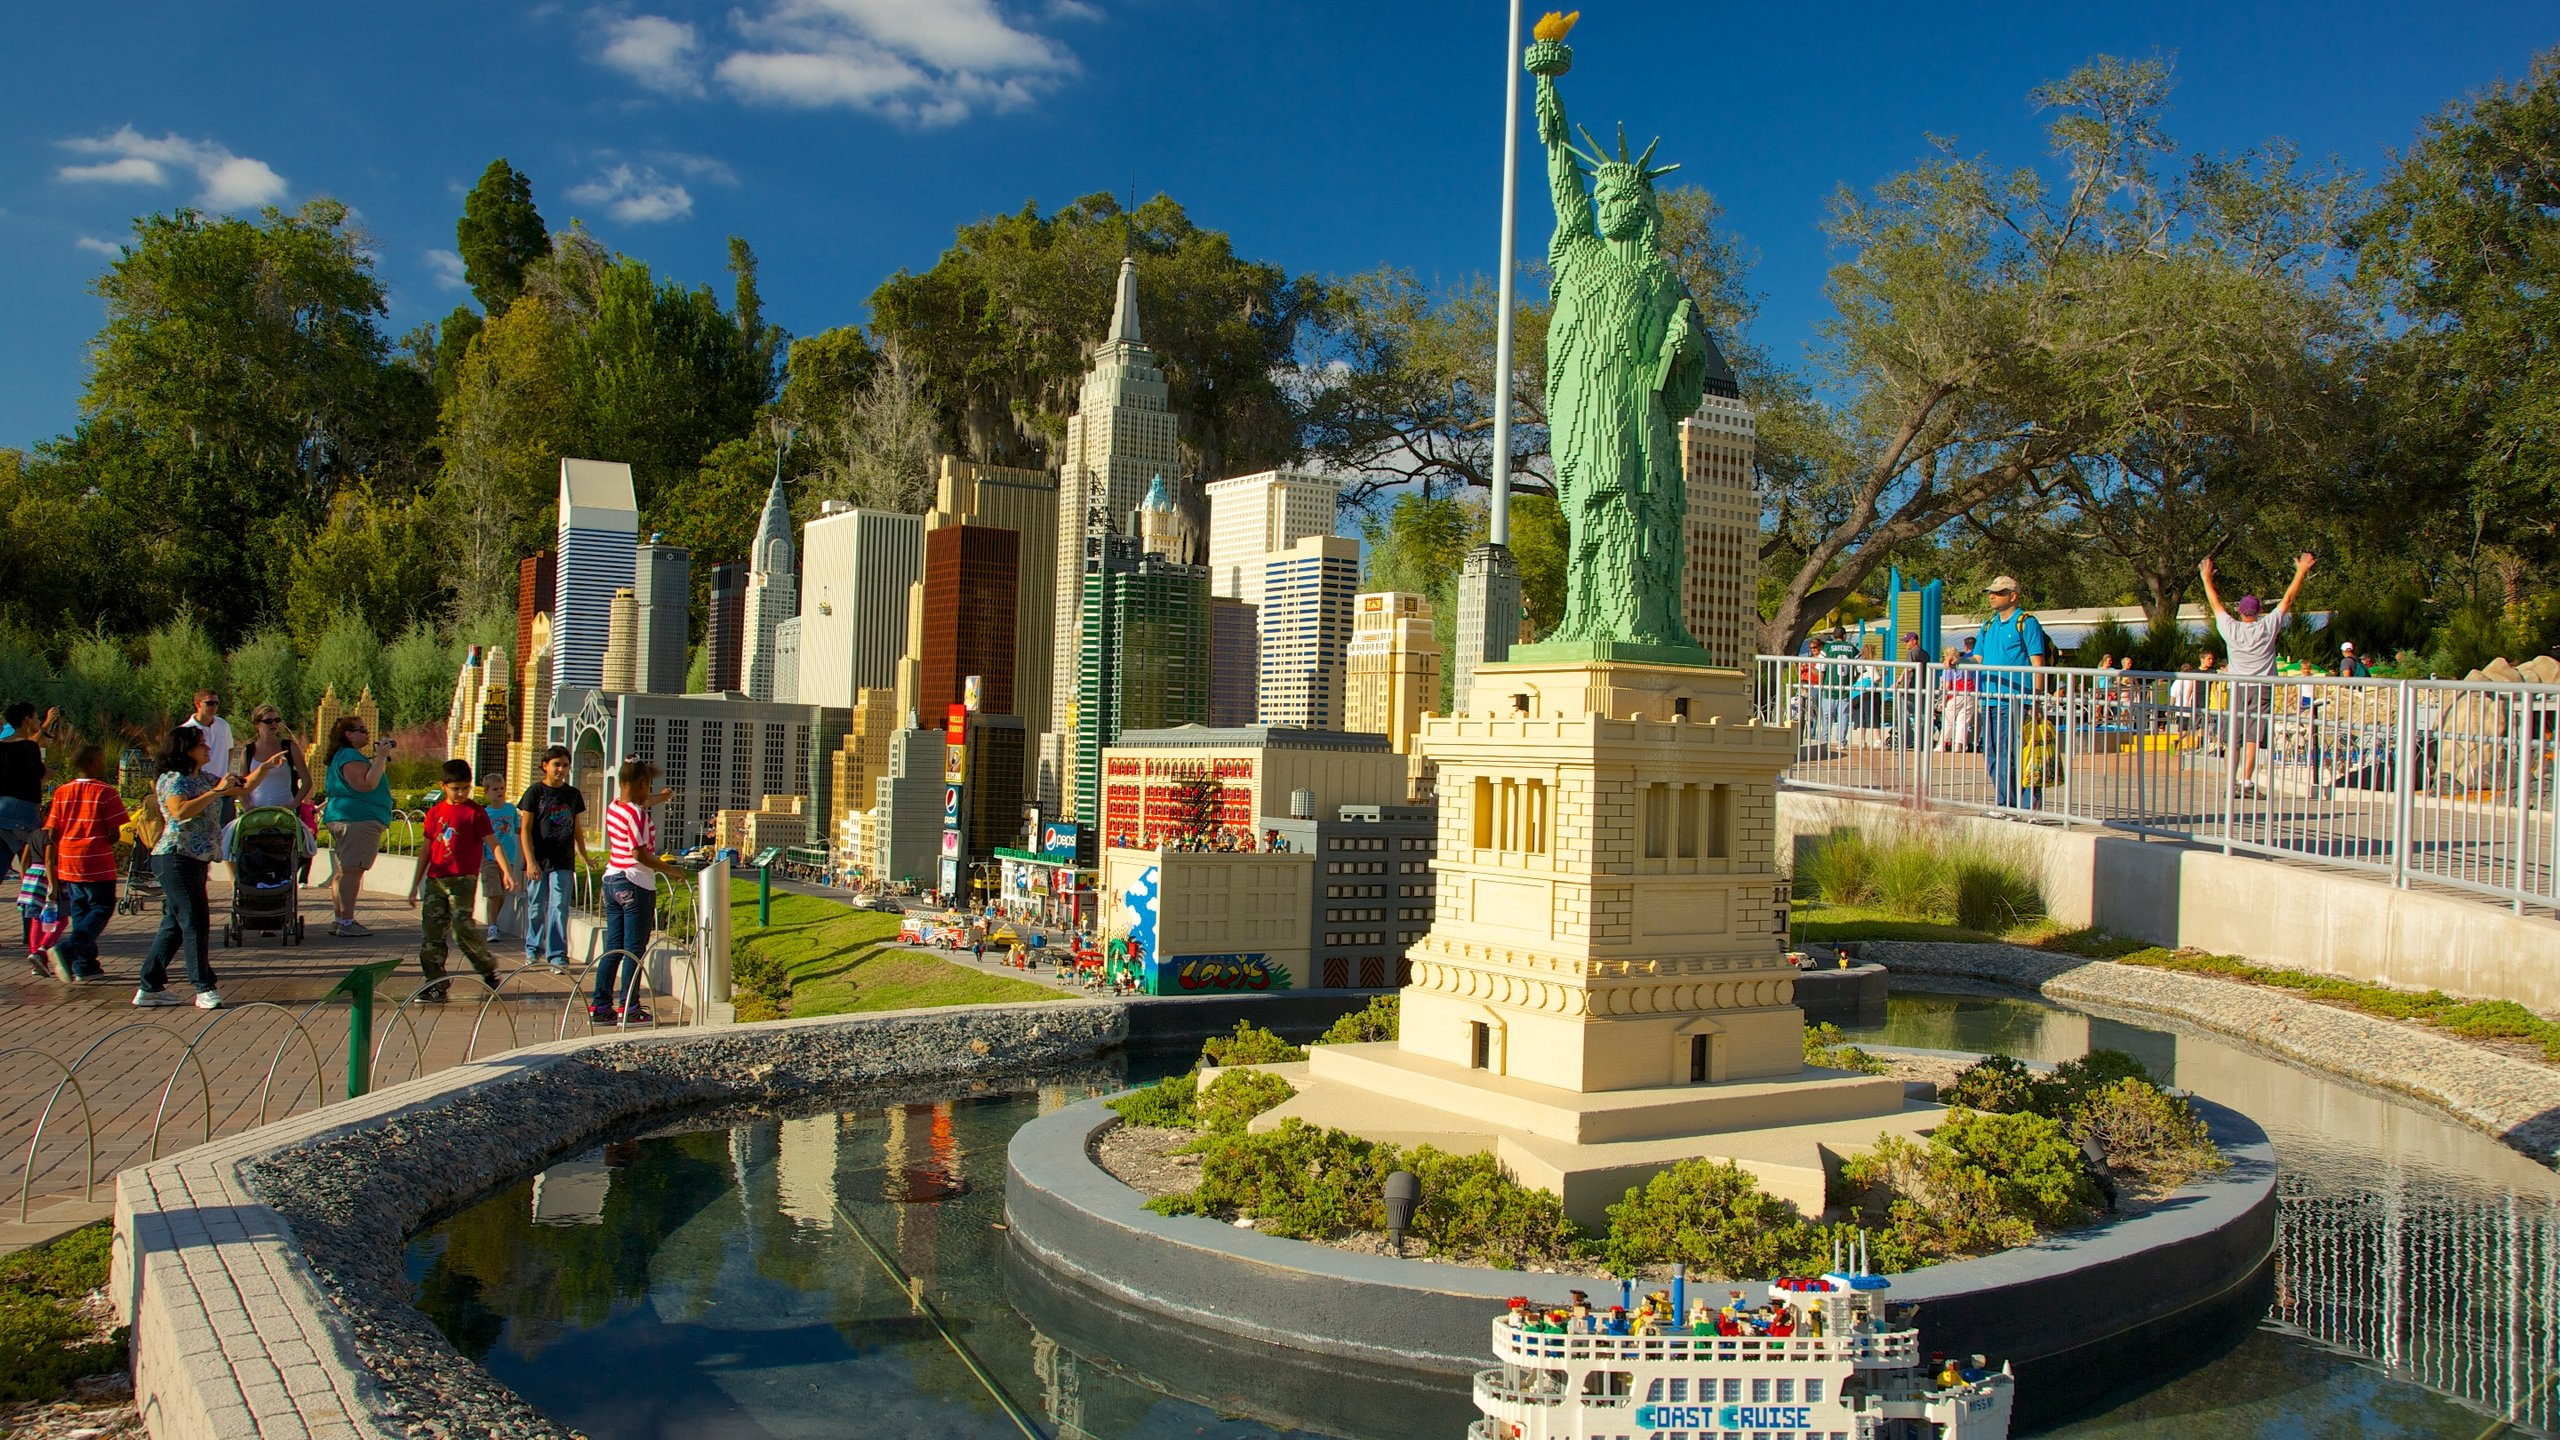 Legoland Florida showing a memorial, a statue or sculpture and a park